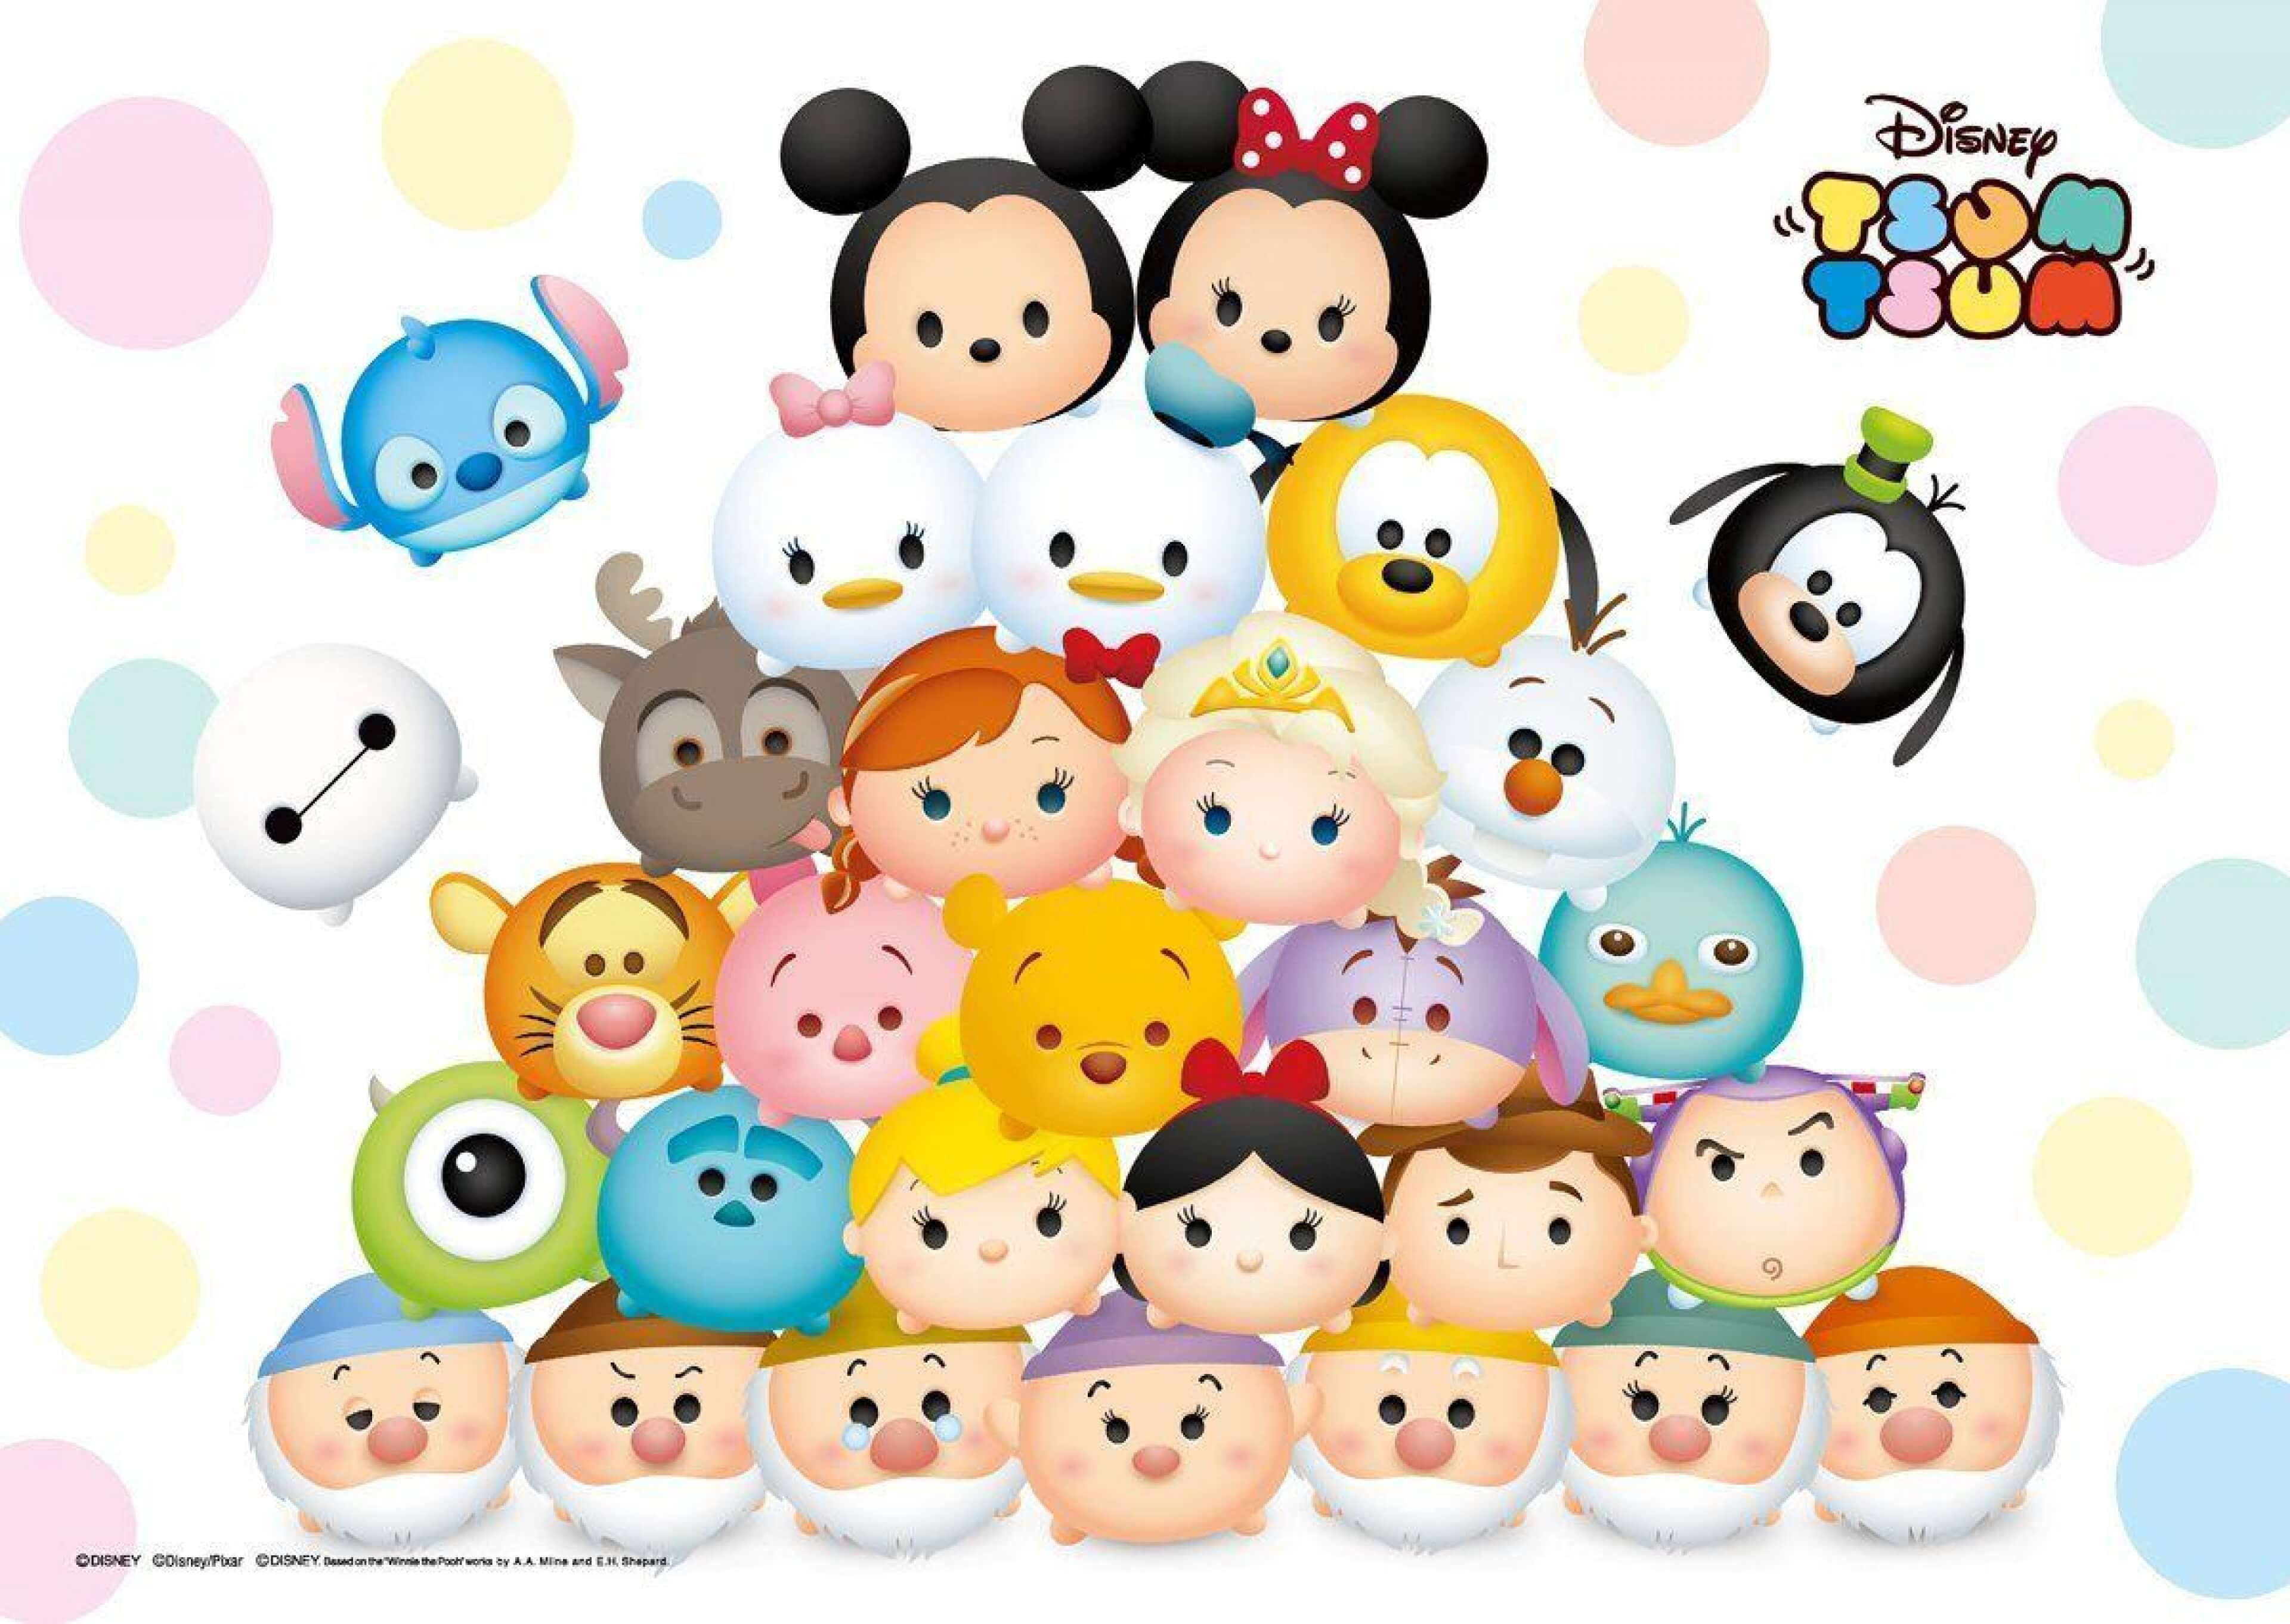 Disney Tsum Tsum Wallpapers - Top Free